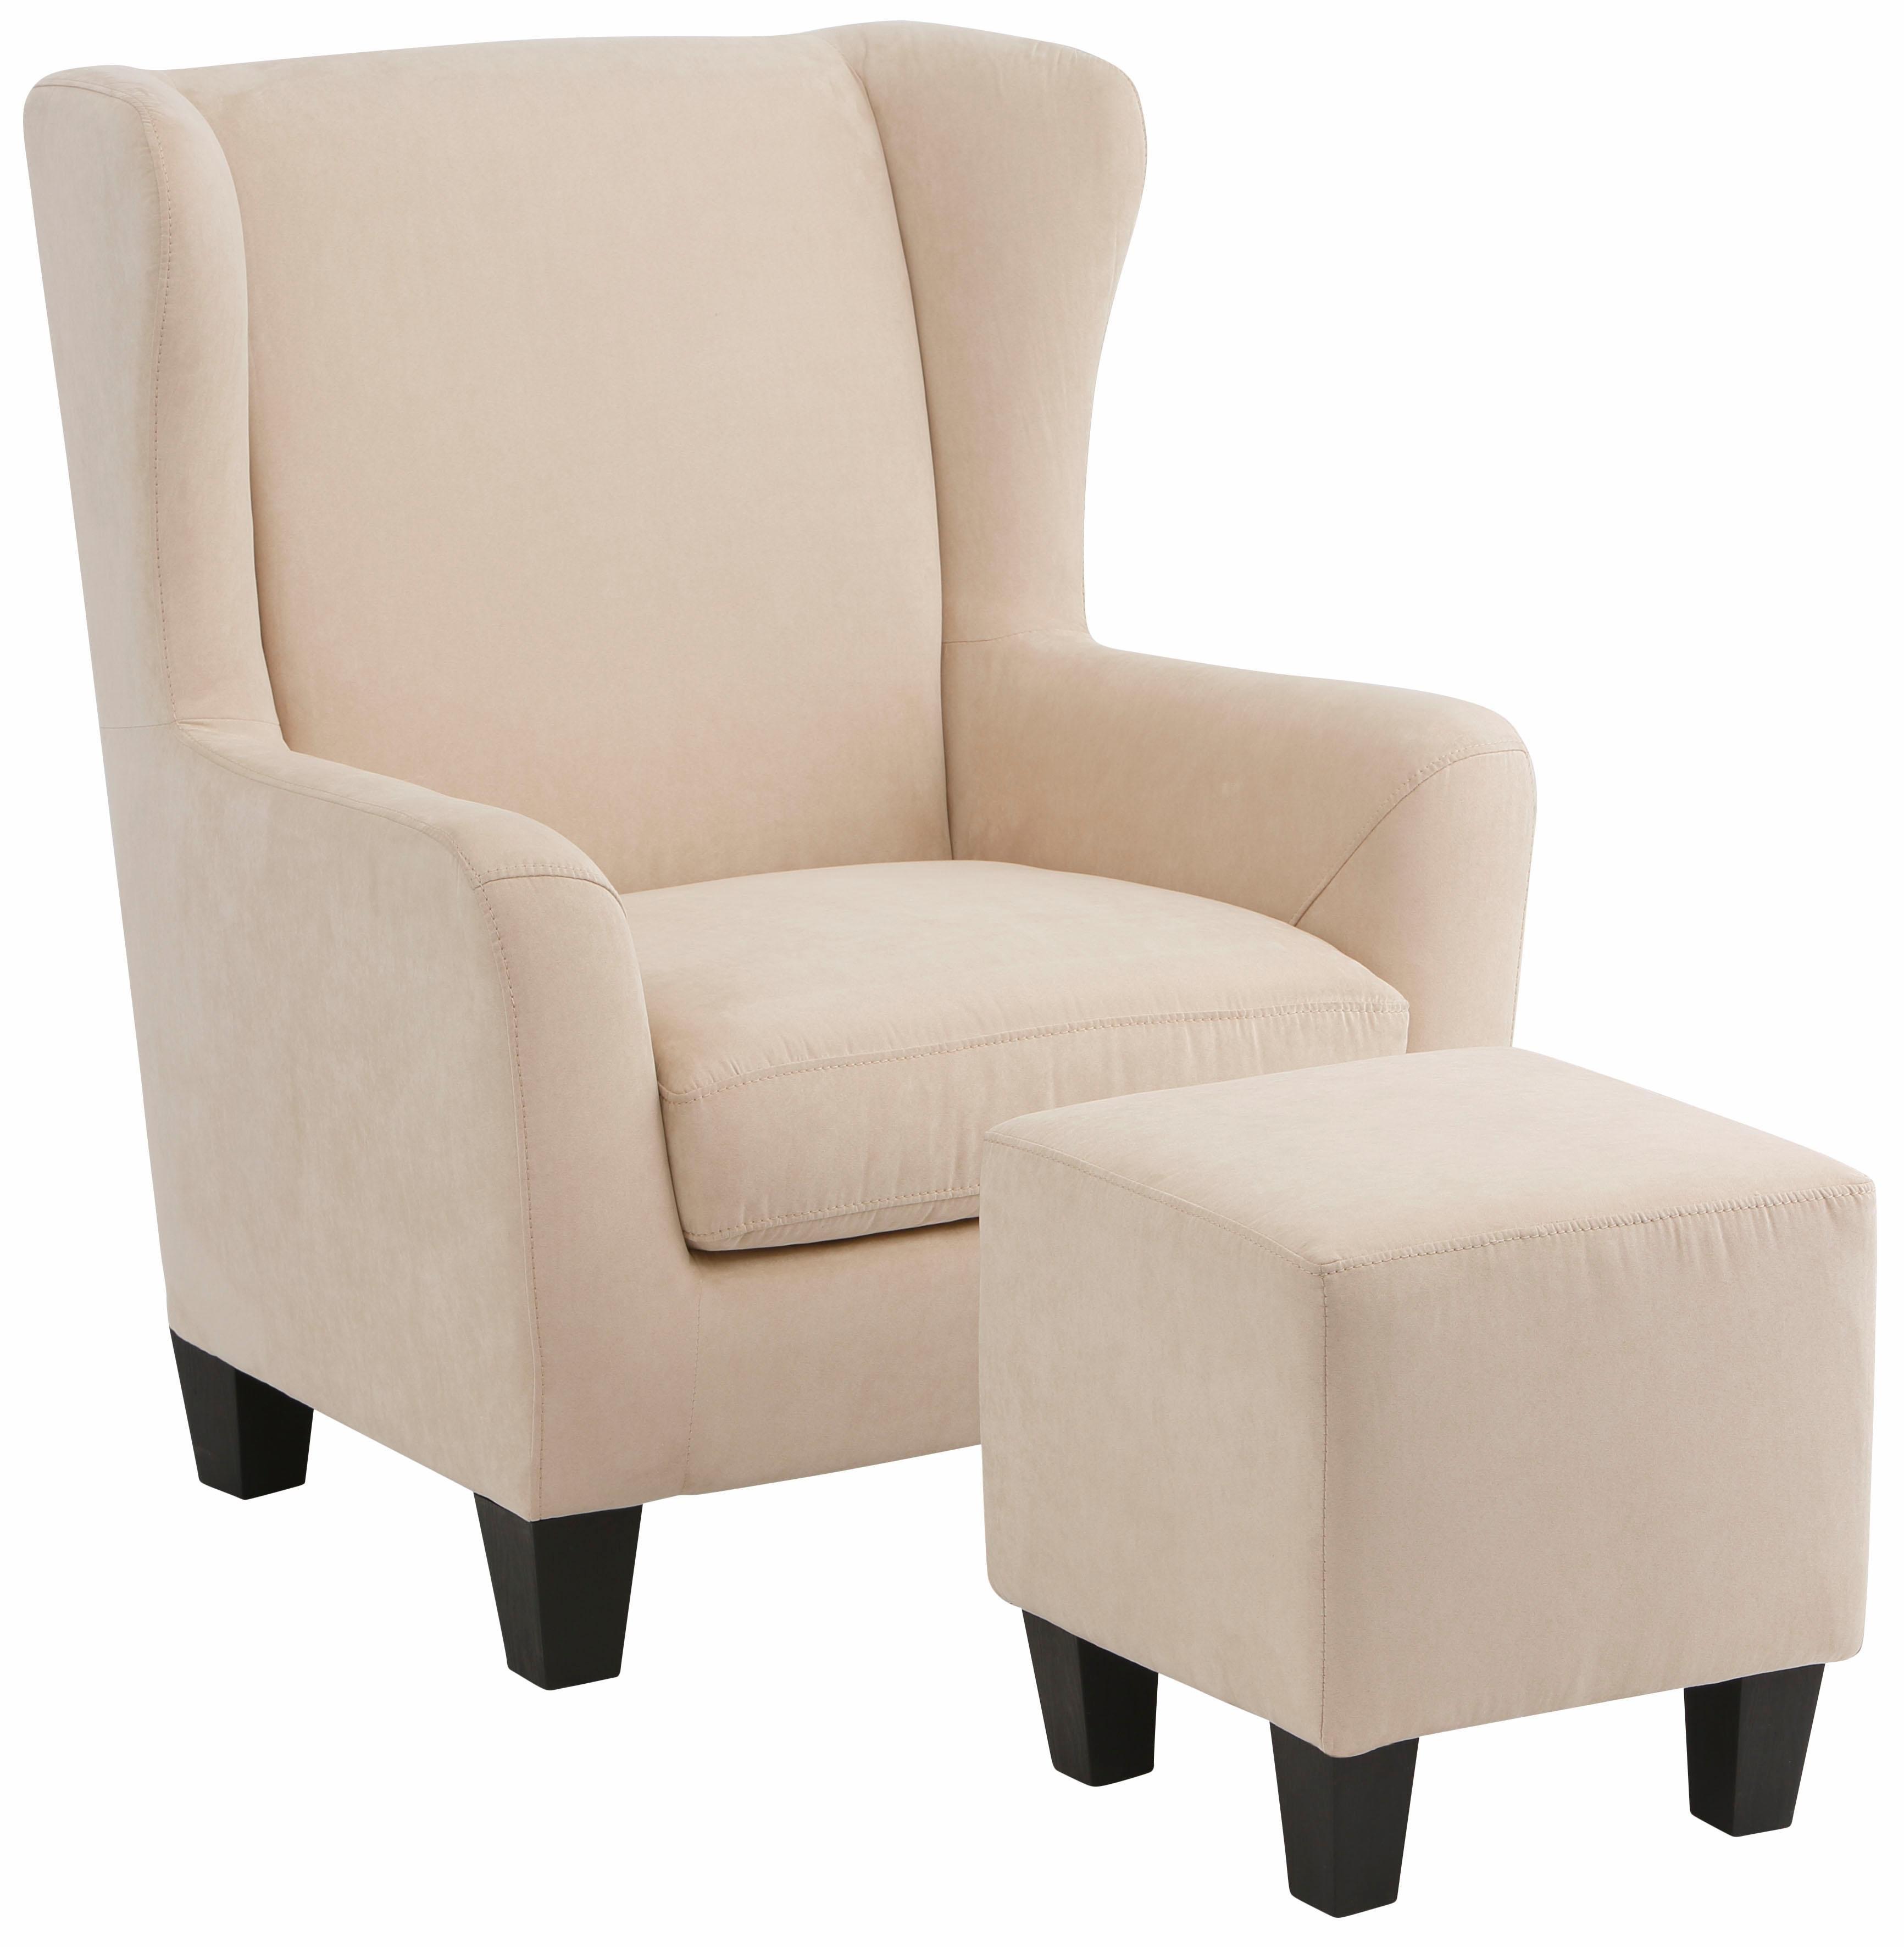 Home affaire fauteuil »Chilly« (Set, 2-tlg., bestehend aus Sessel und Hocker) in de webshop van OTTO kopen